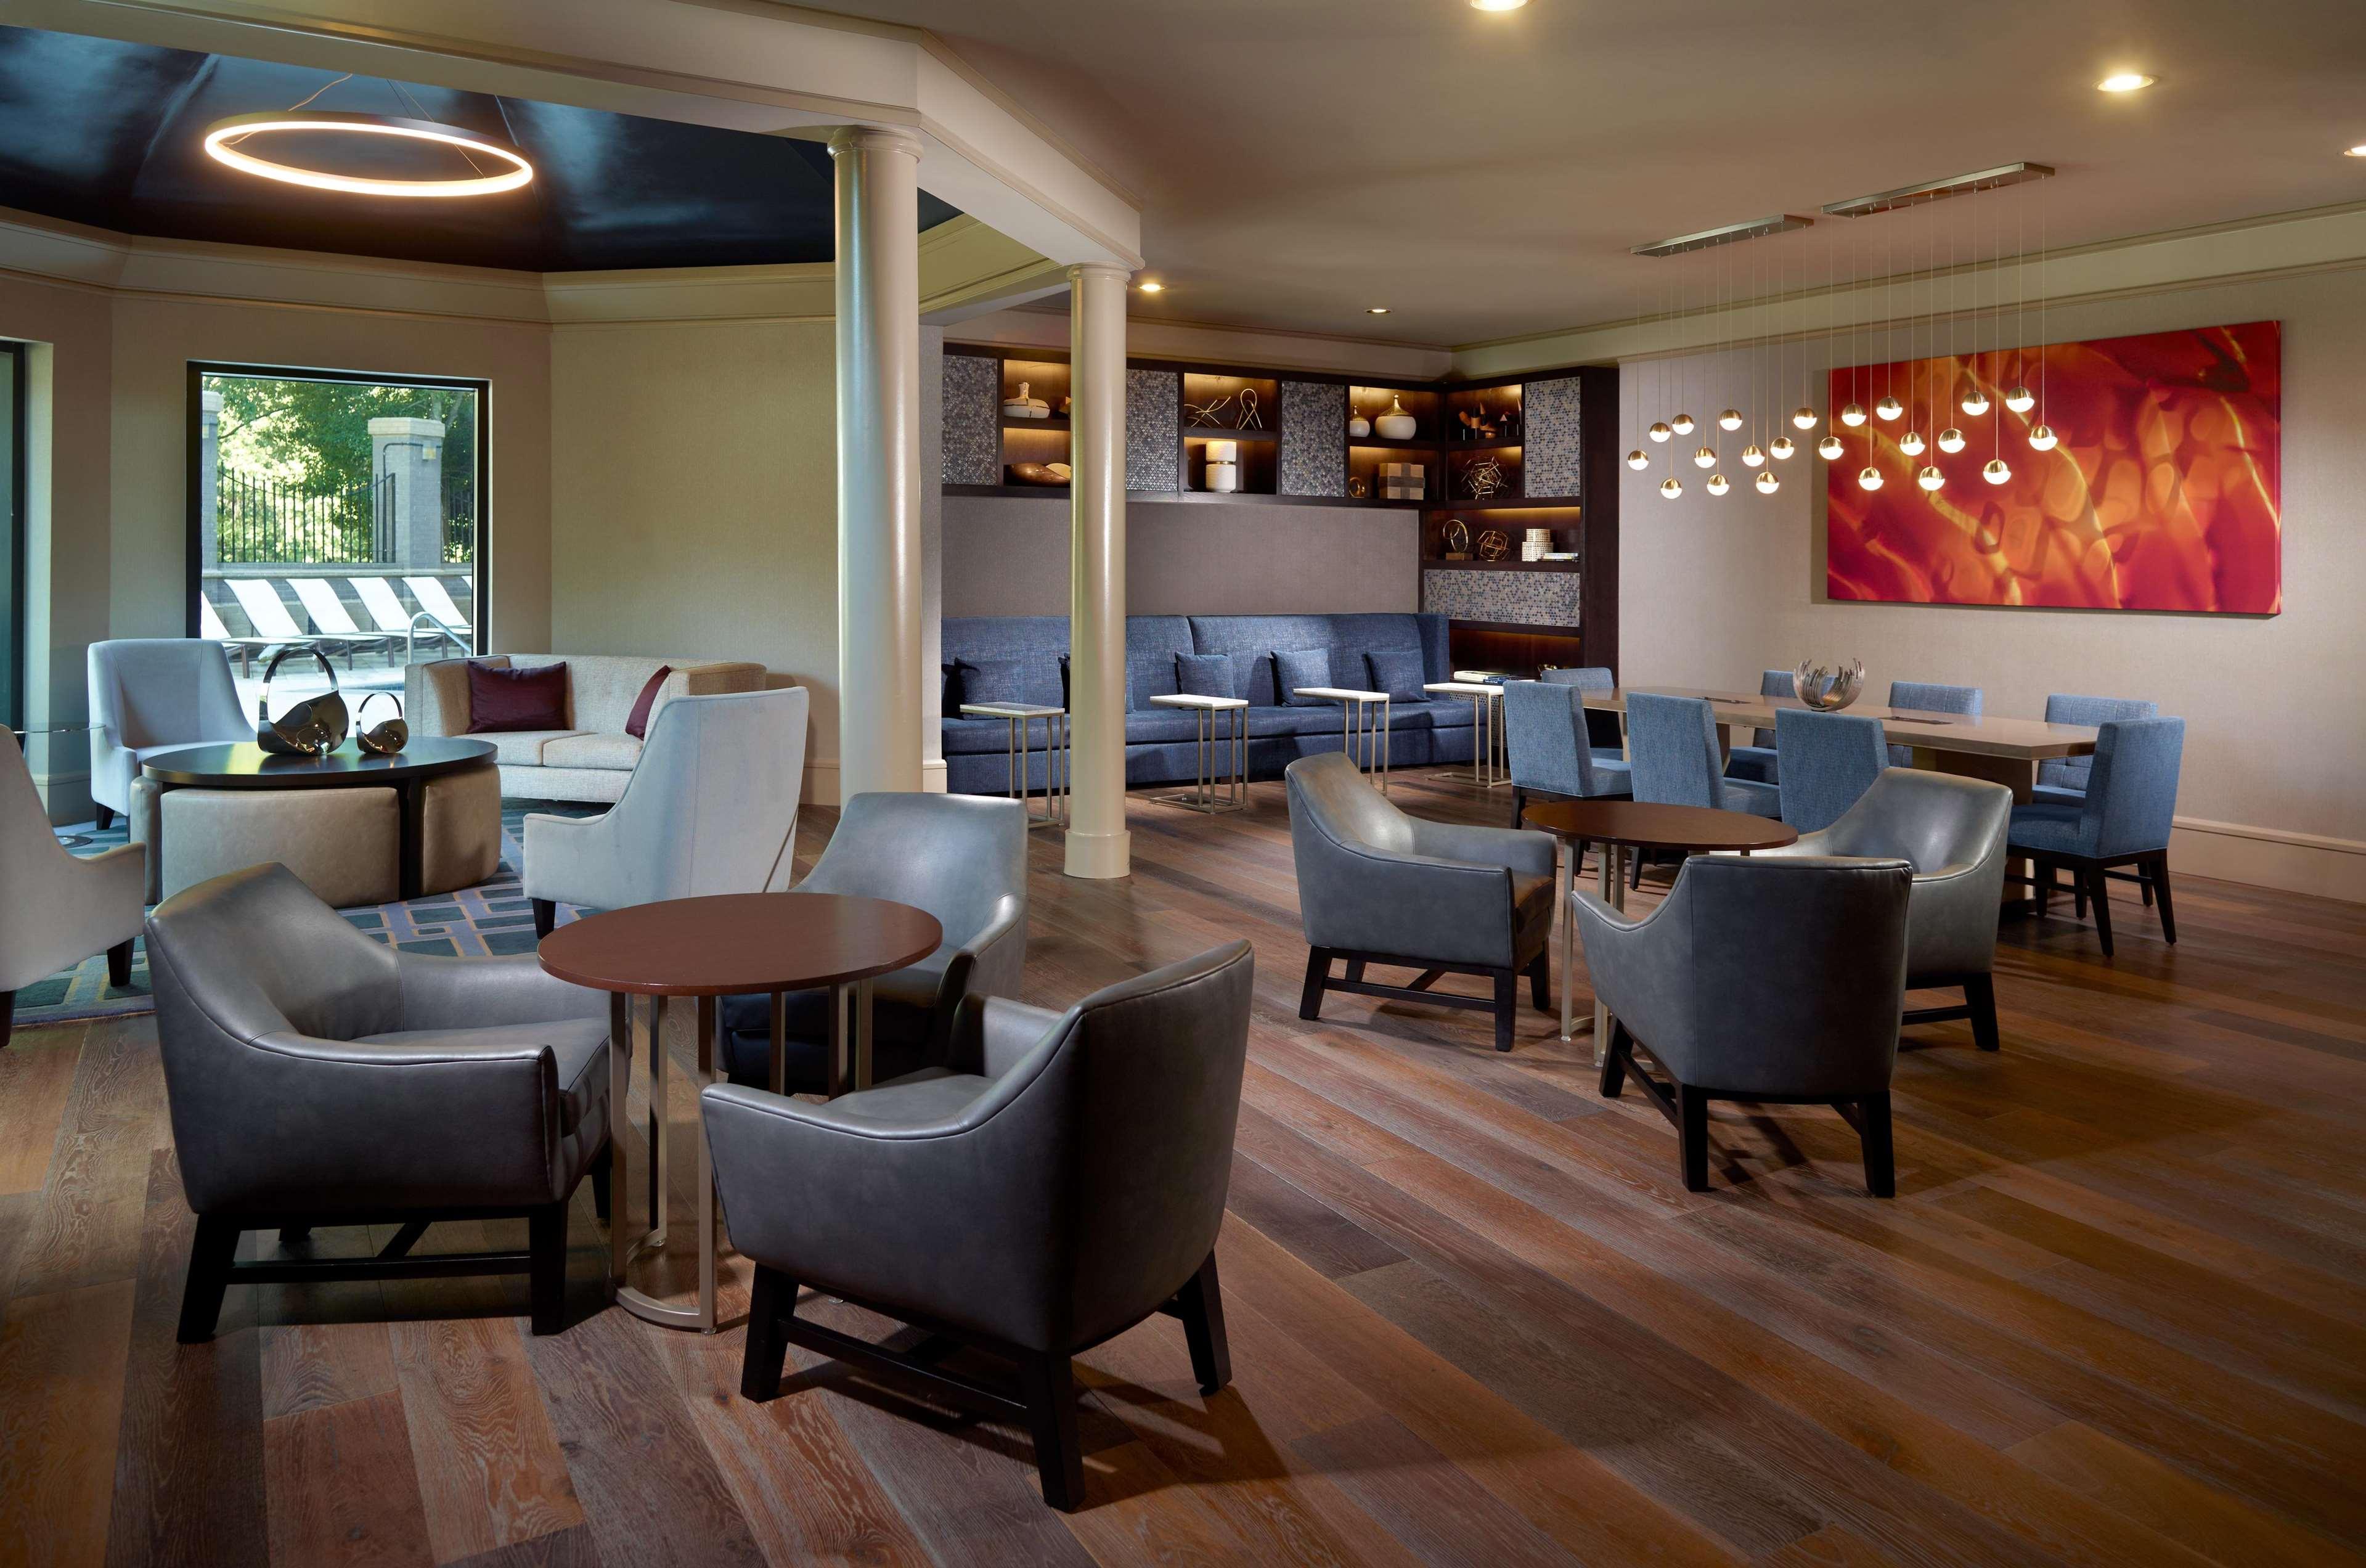 Suite Lounge ATL, Atlanta - Restaurant Reviews, Phone Number Luckie lounge atlanta photos